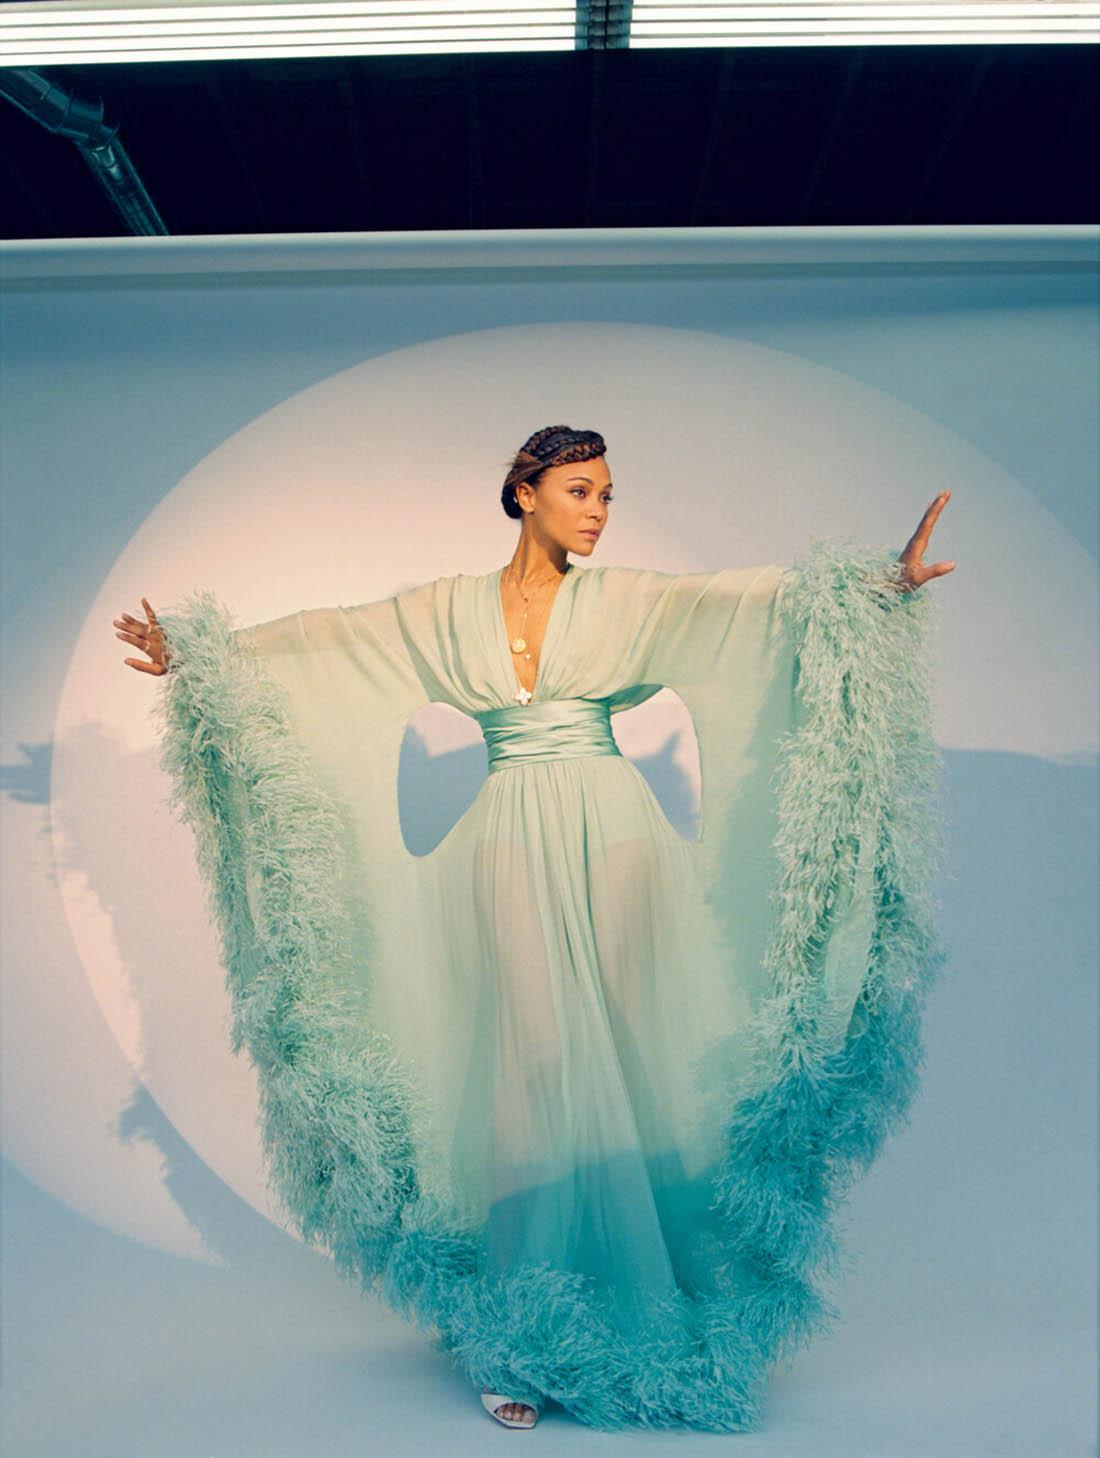 Zoe Saldana covers Flaunt Magazine Issue 174 by Sasha Samsonova